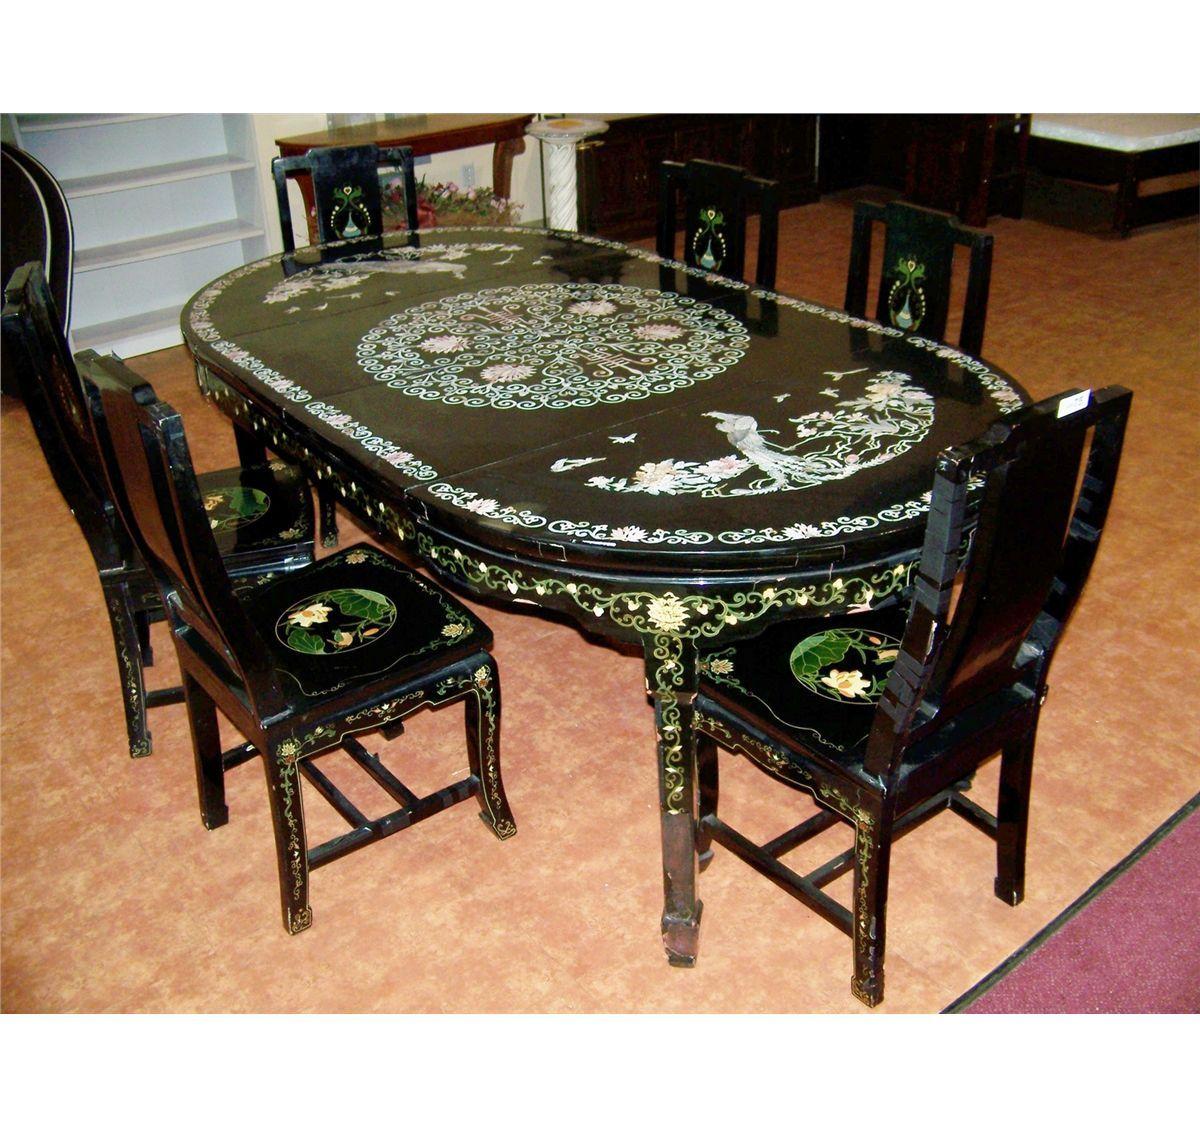 Chinese Dining Room Furniture  Modern Affordable Furniture Check Best Chinese Dining Room Table Decorating Design